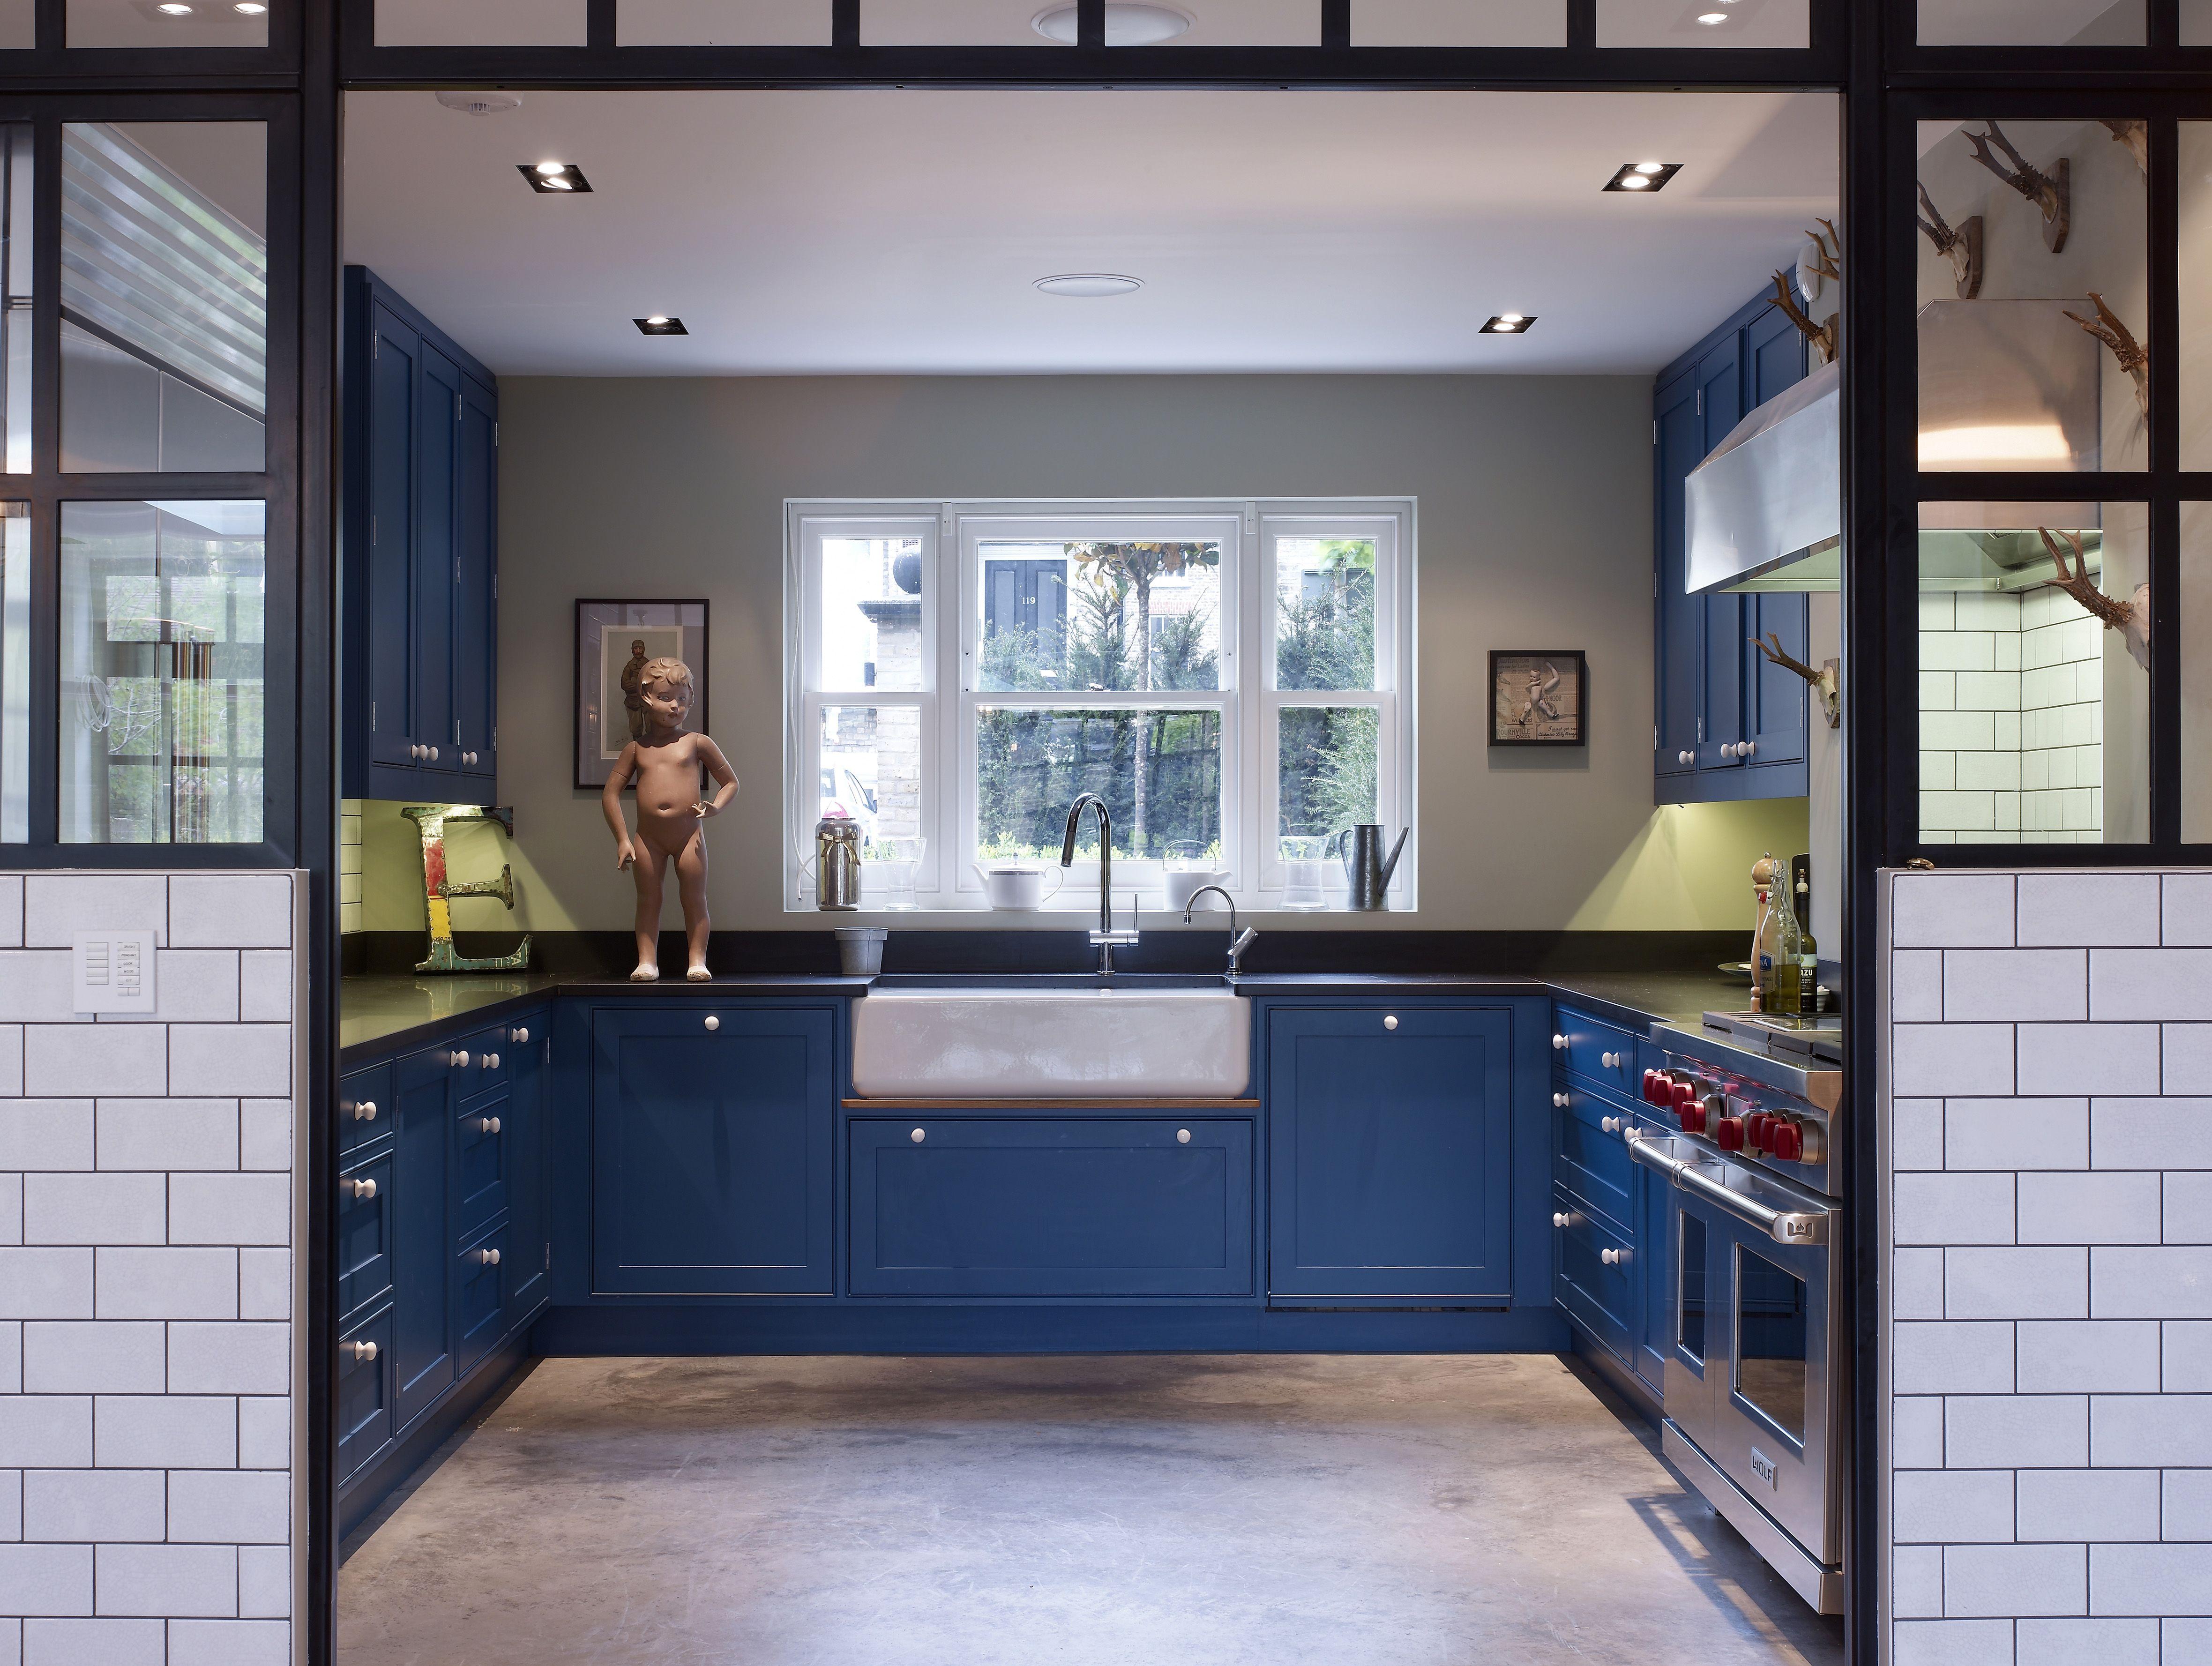 Kitchen Ideas Ealing.House Ealing Home Interior Design Kitchen Design By Stiff And